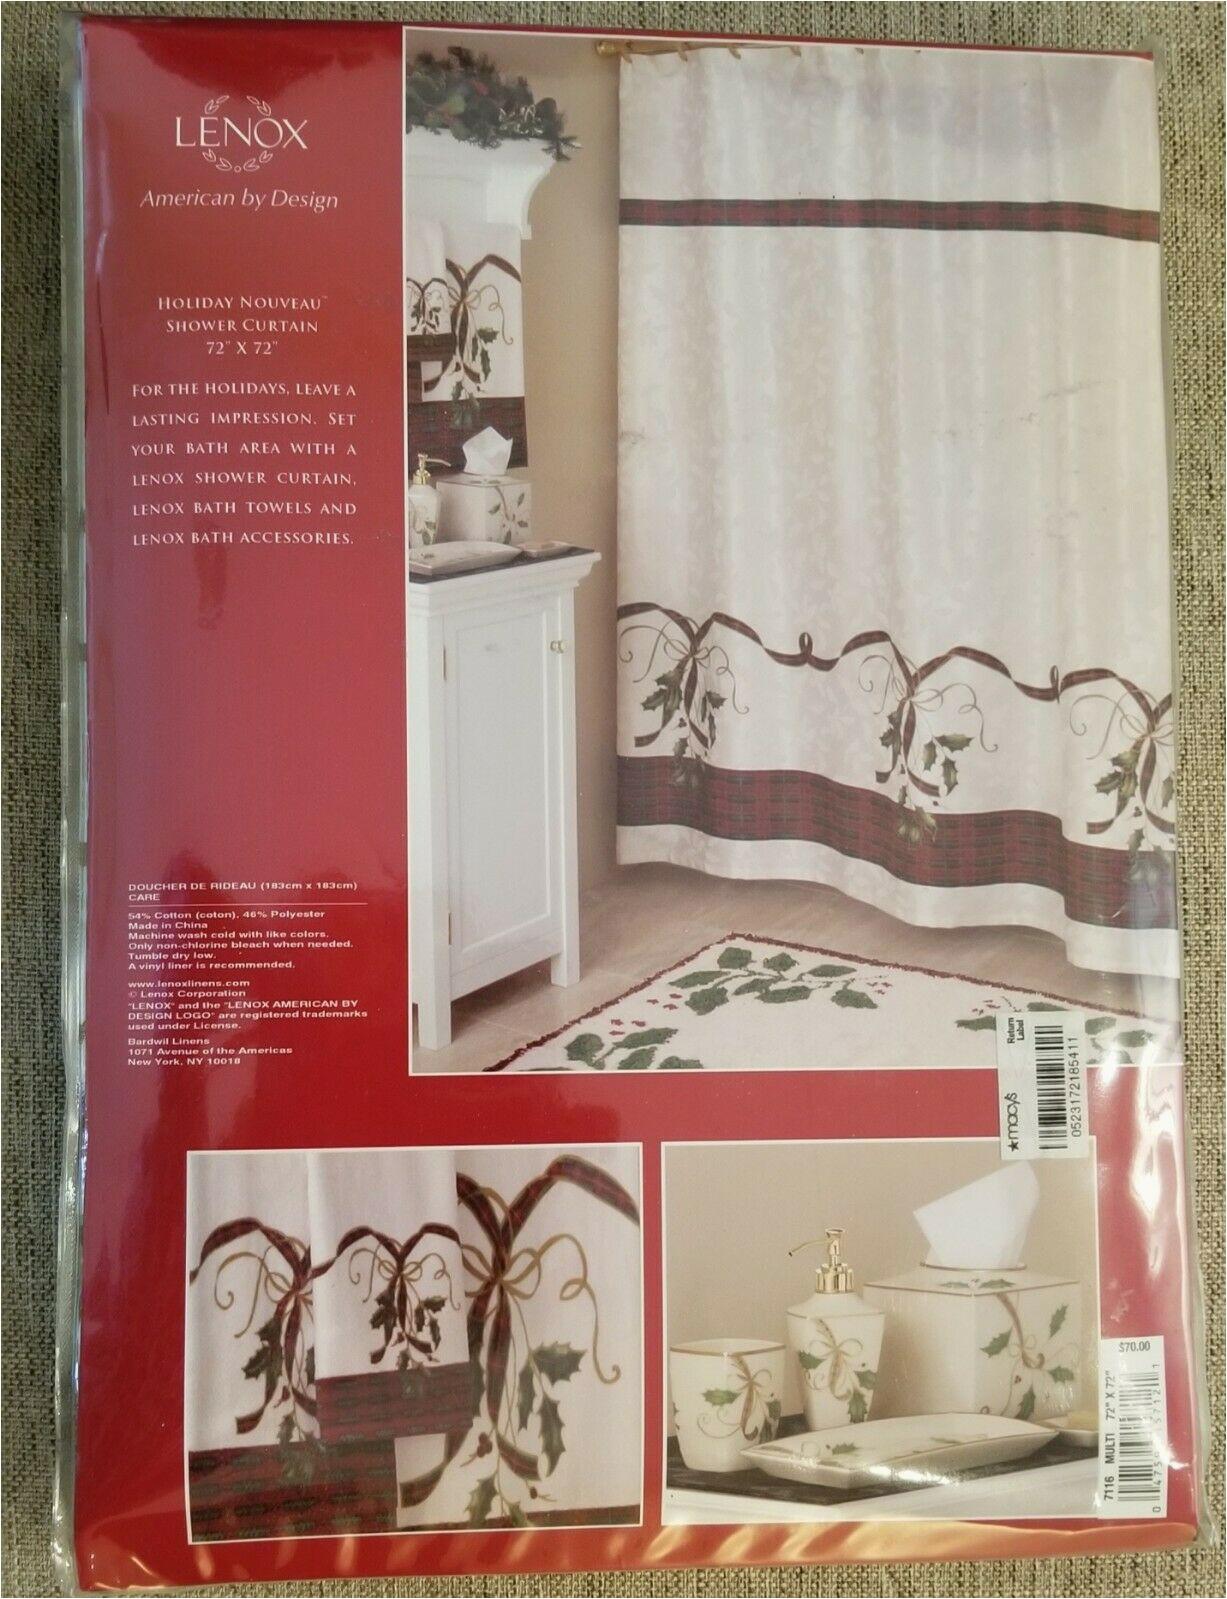 Lenox Holiday Nouveau Bath Rug Lenox Holiday Shower Curtain